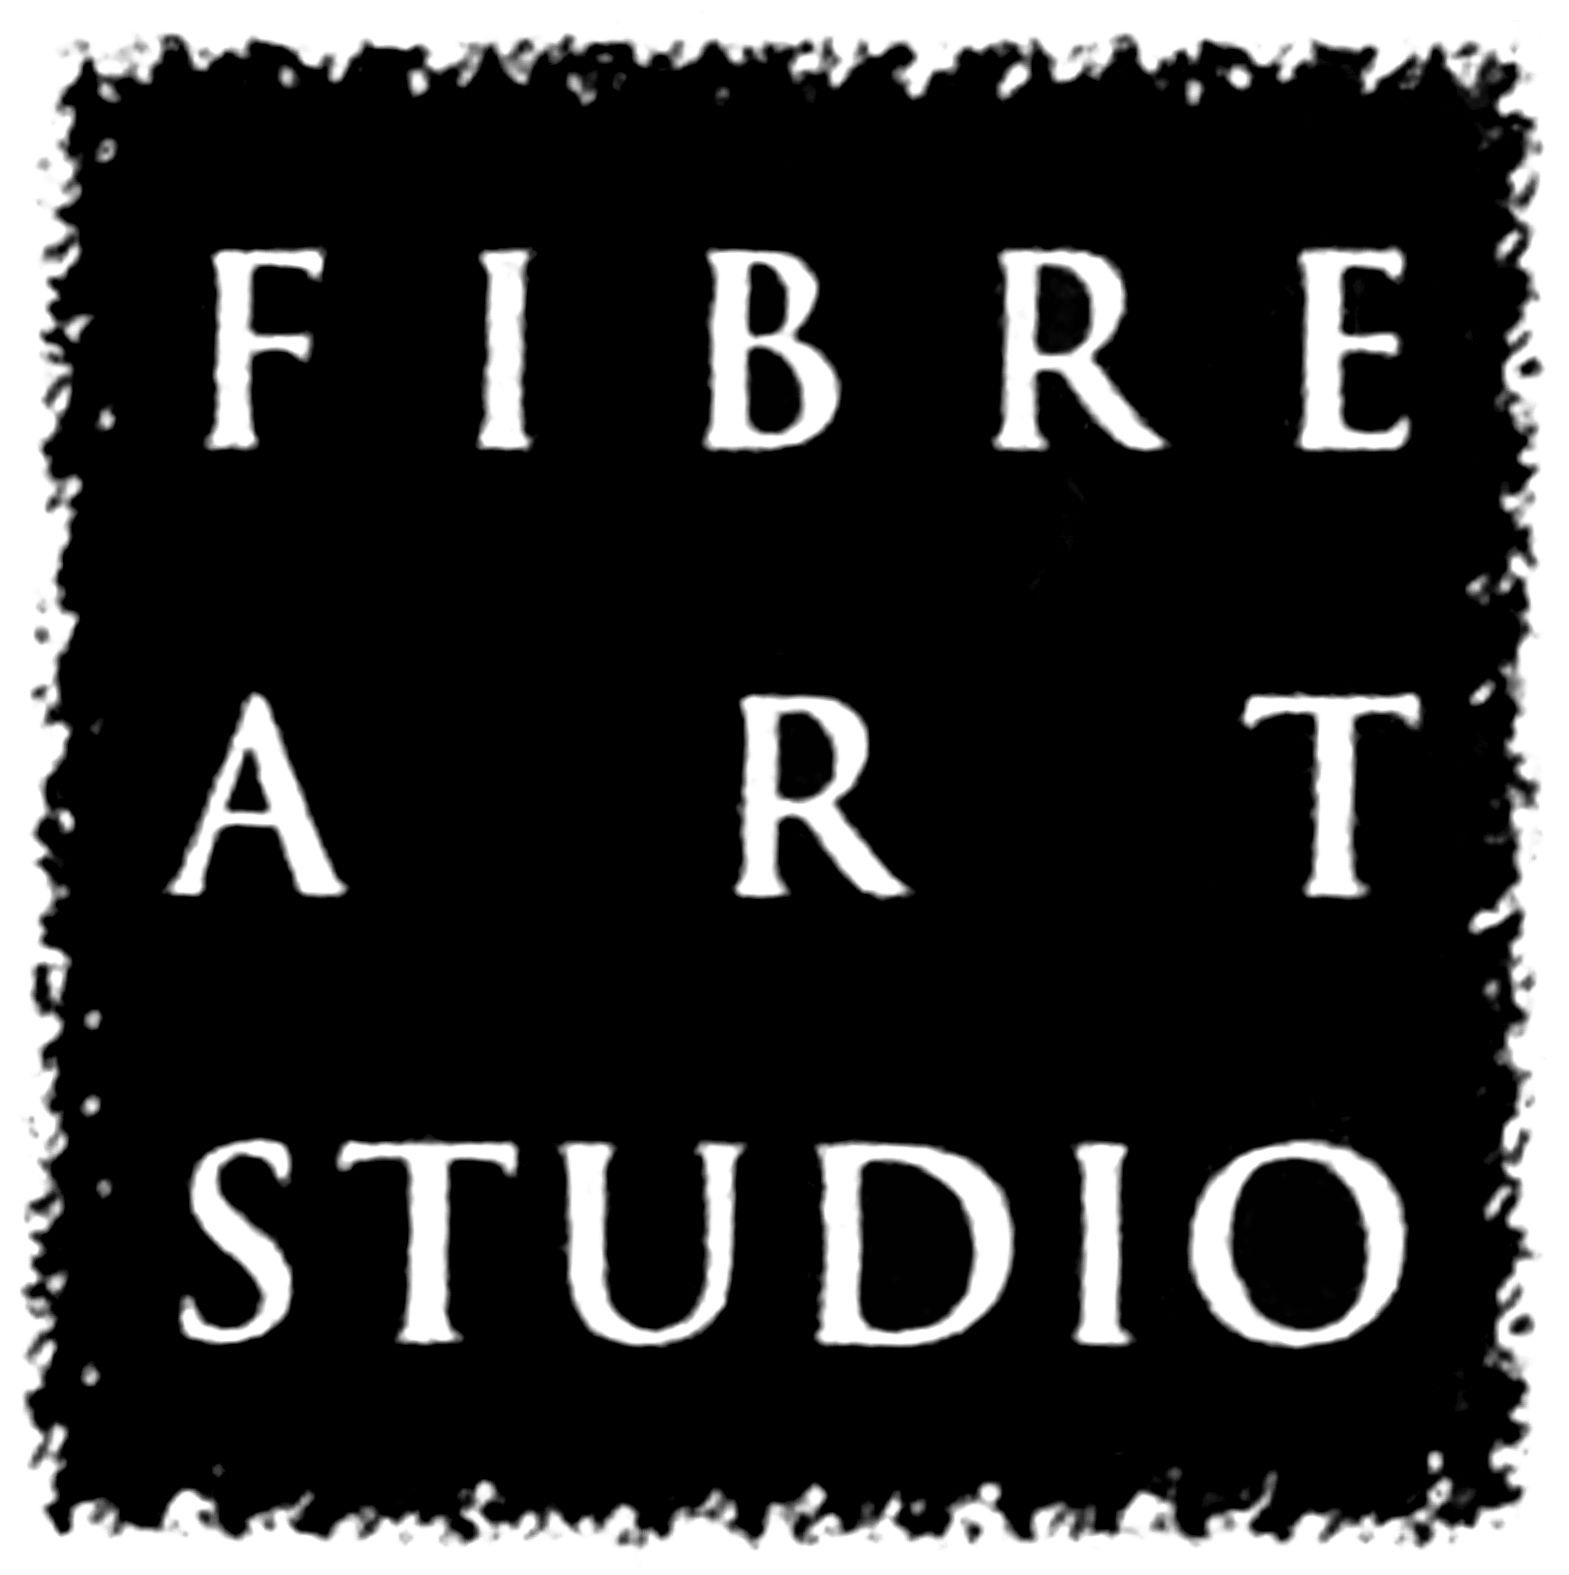 Fibre Art Studio    1610 Johnston Street   Vancouver, BC V6H 3S2    604-688-3047